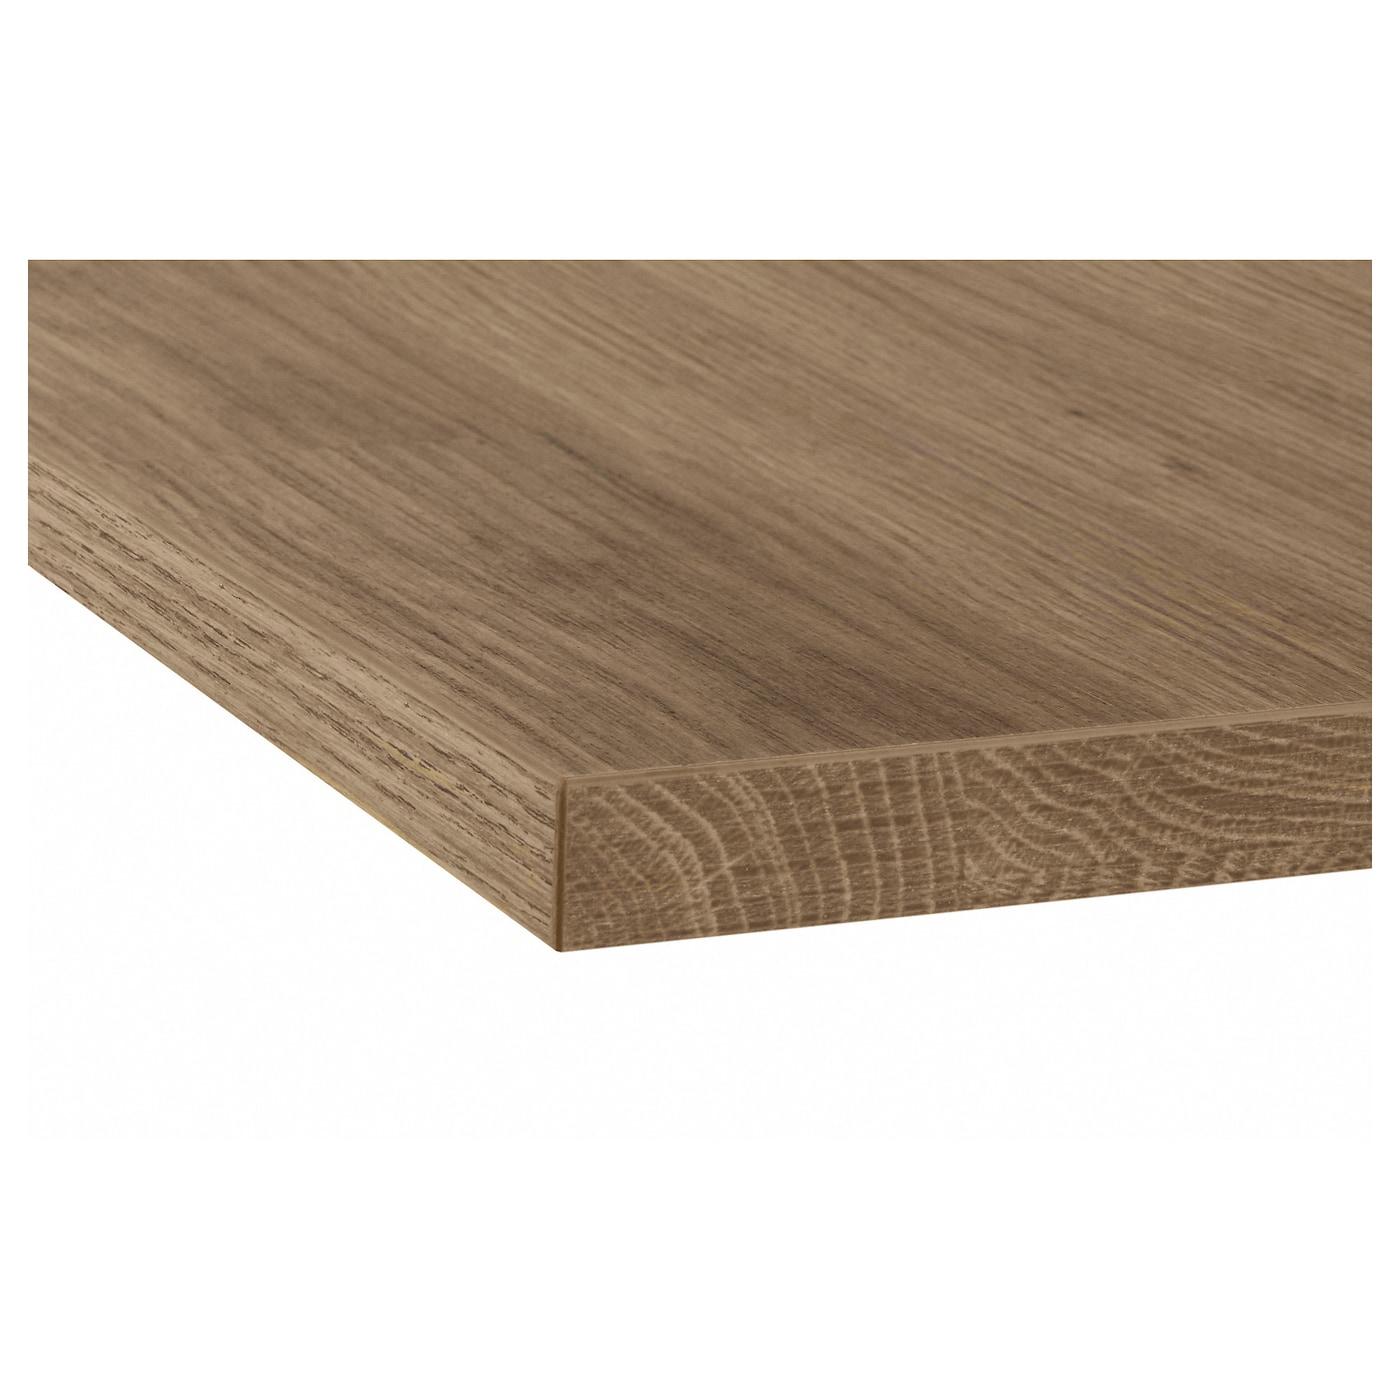 ekbacken custom made worktop dark oak effect laminate 63 6 125x2 8 cm ikea. Black Bedroom Furniture Sets. Home Design Ideas